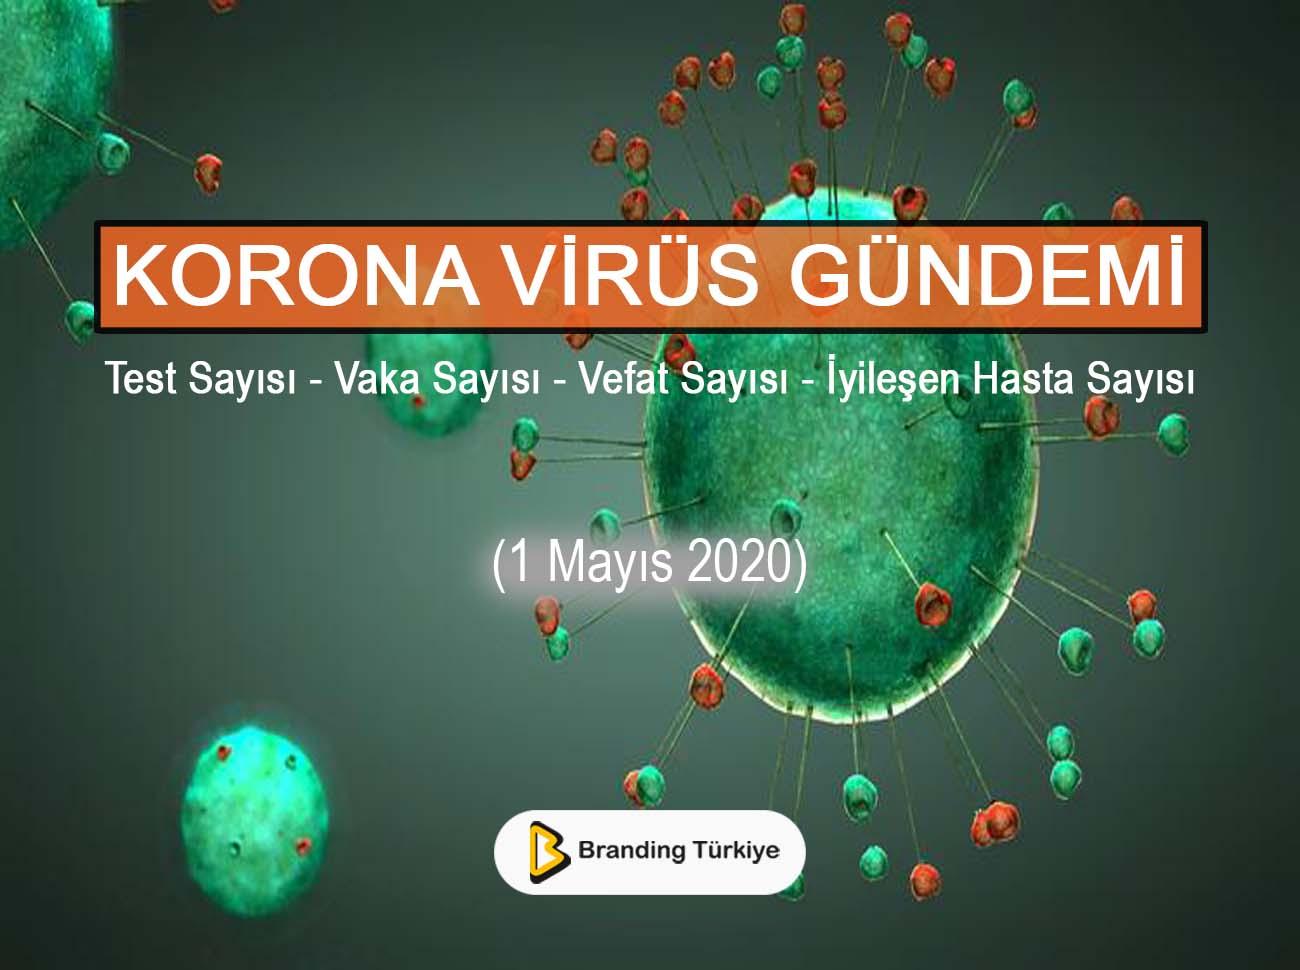 Korona Virüs Gündemi (1 Mayıs 2020)